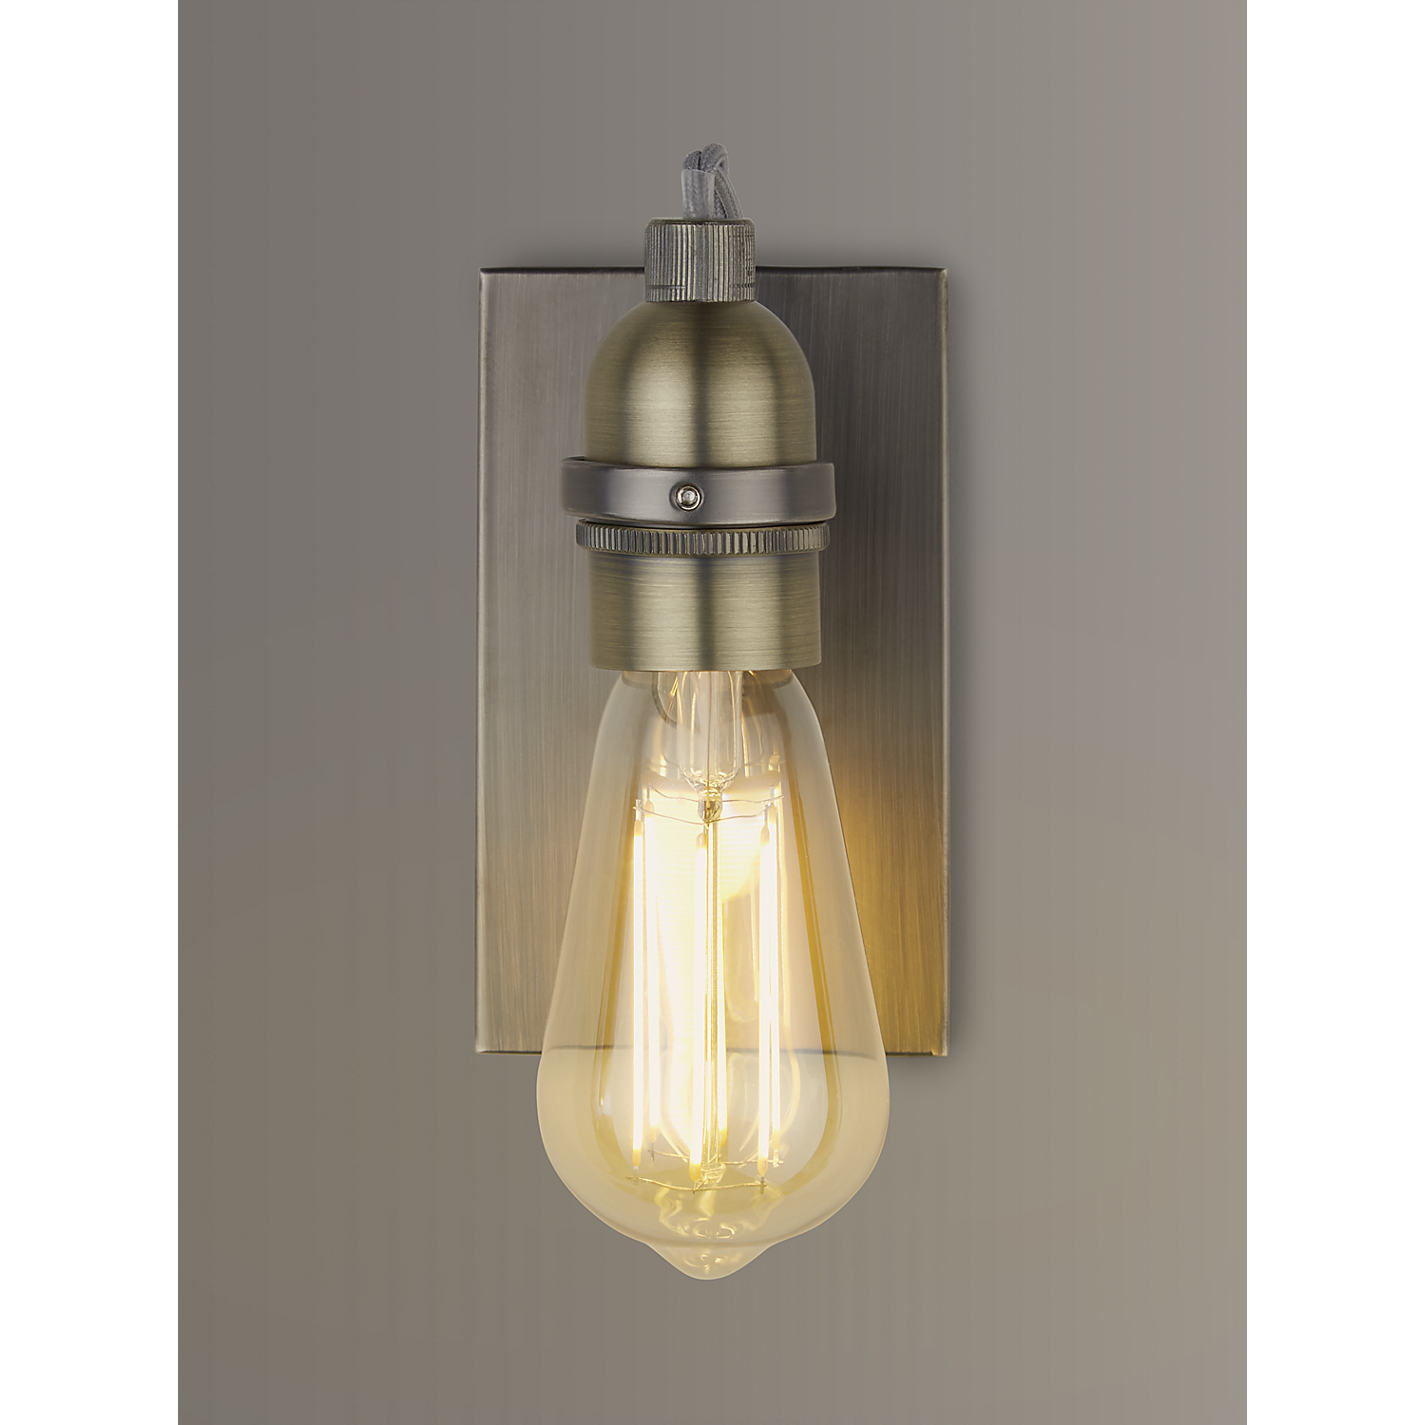 John Lewis Ceiling Lights Antique Brass : Wall lights for bedroom john lewis buy meena